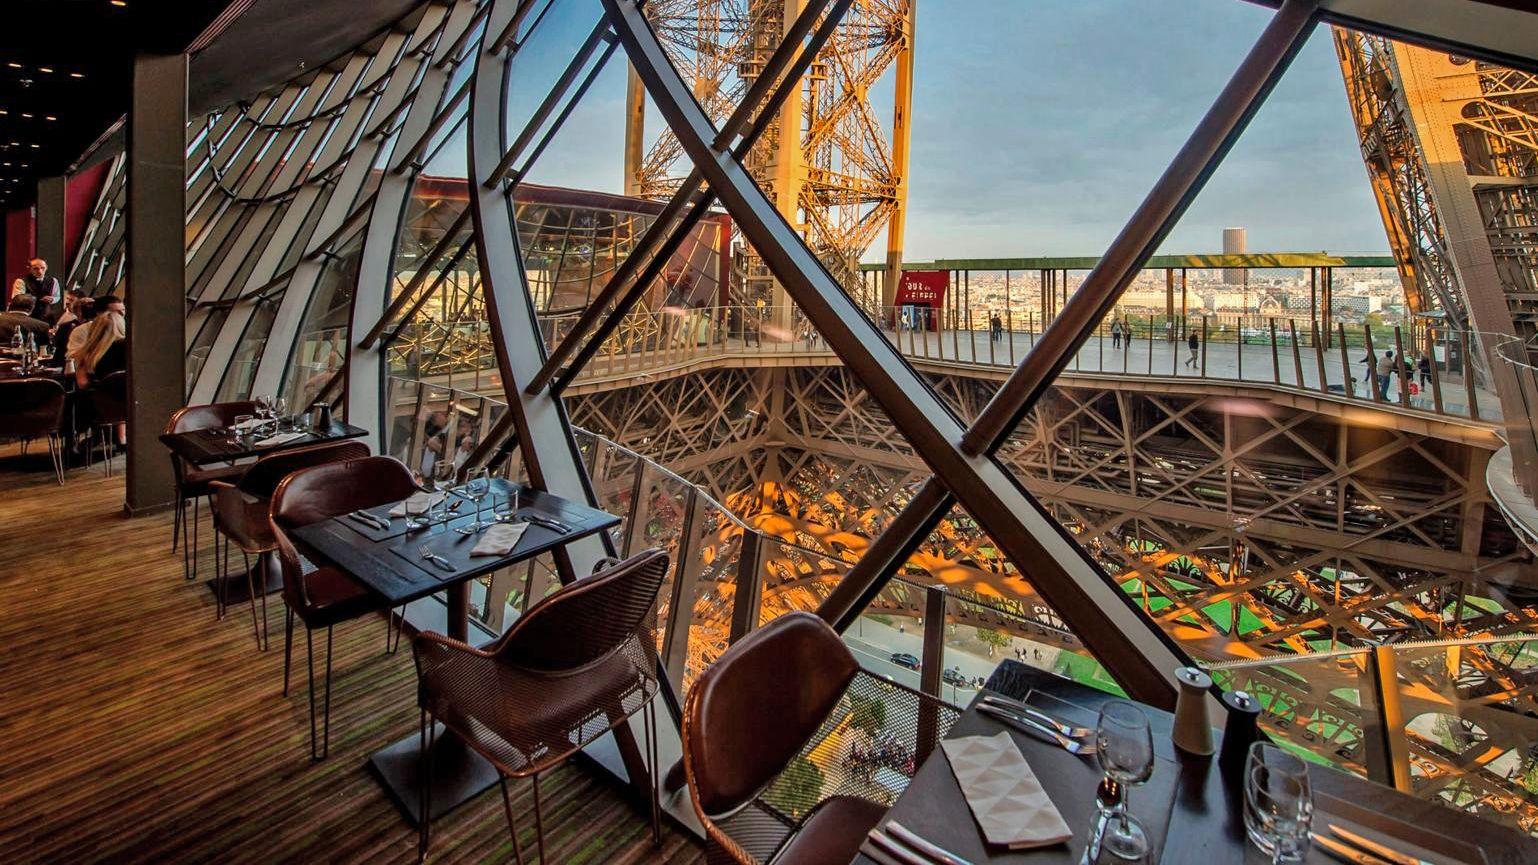 dinner at eiffel tower in paris